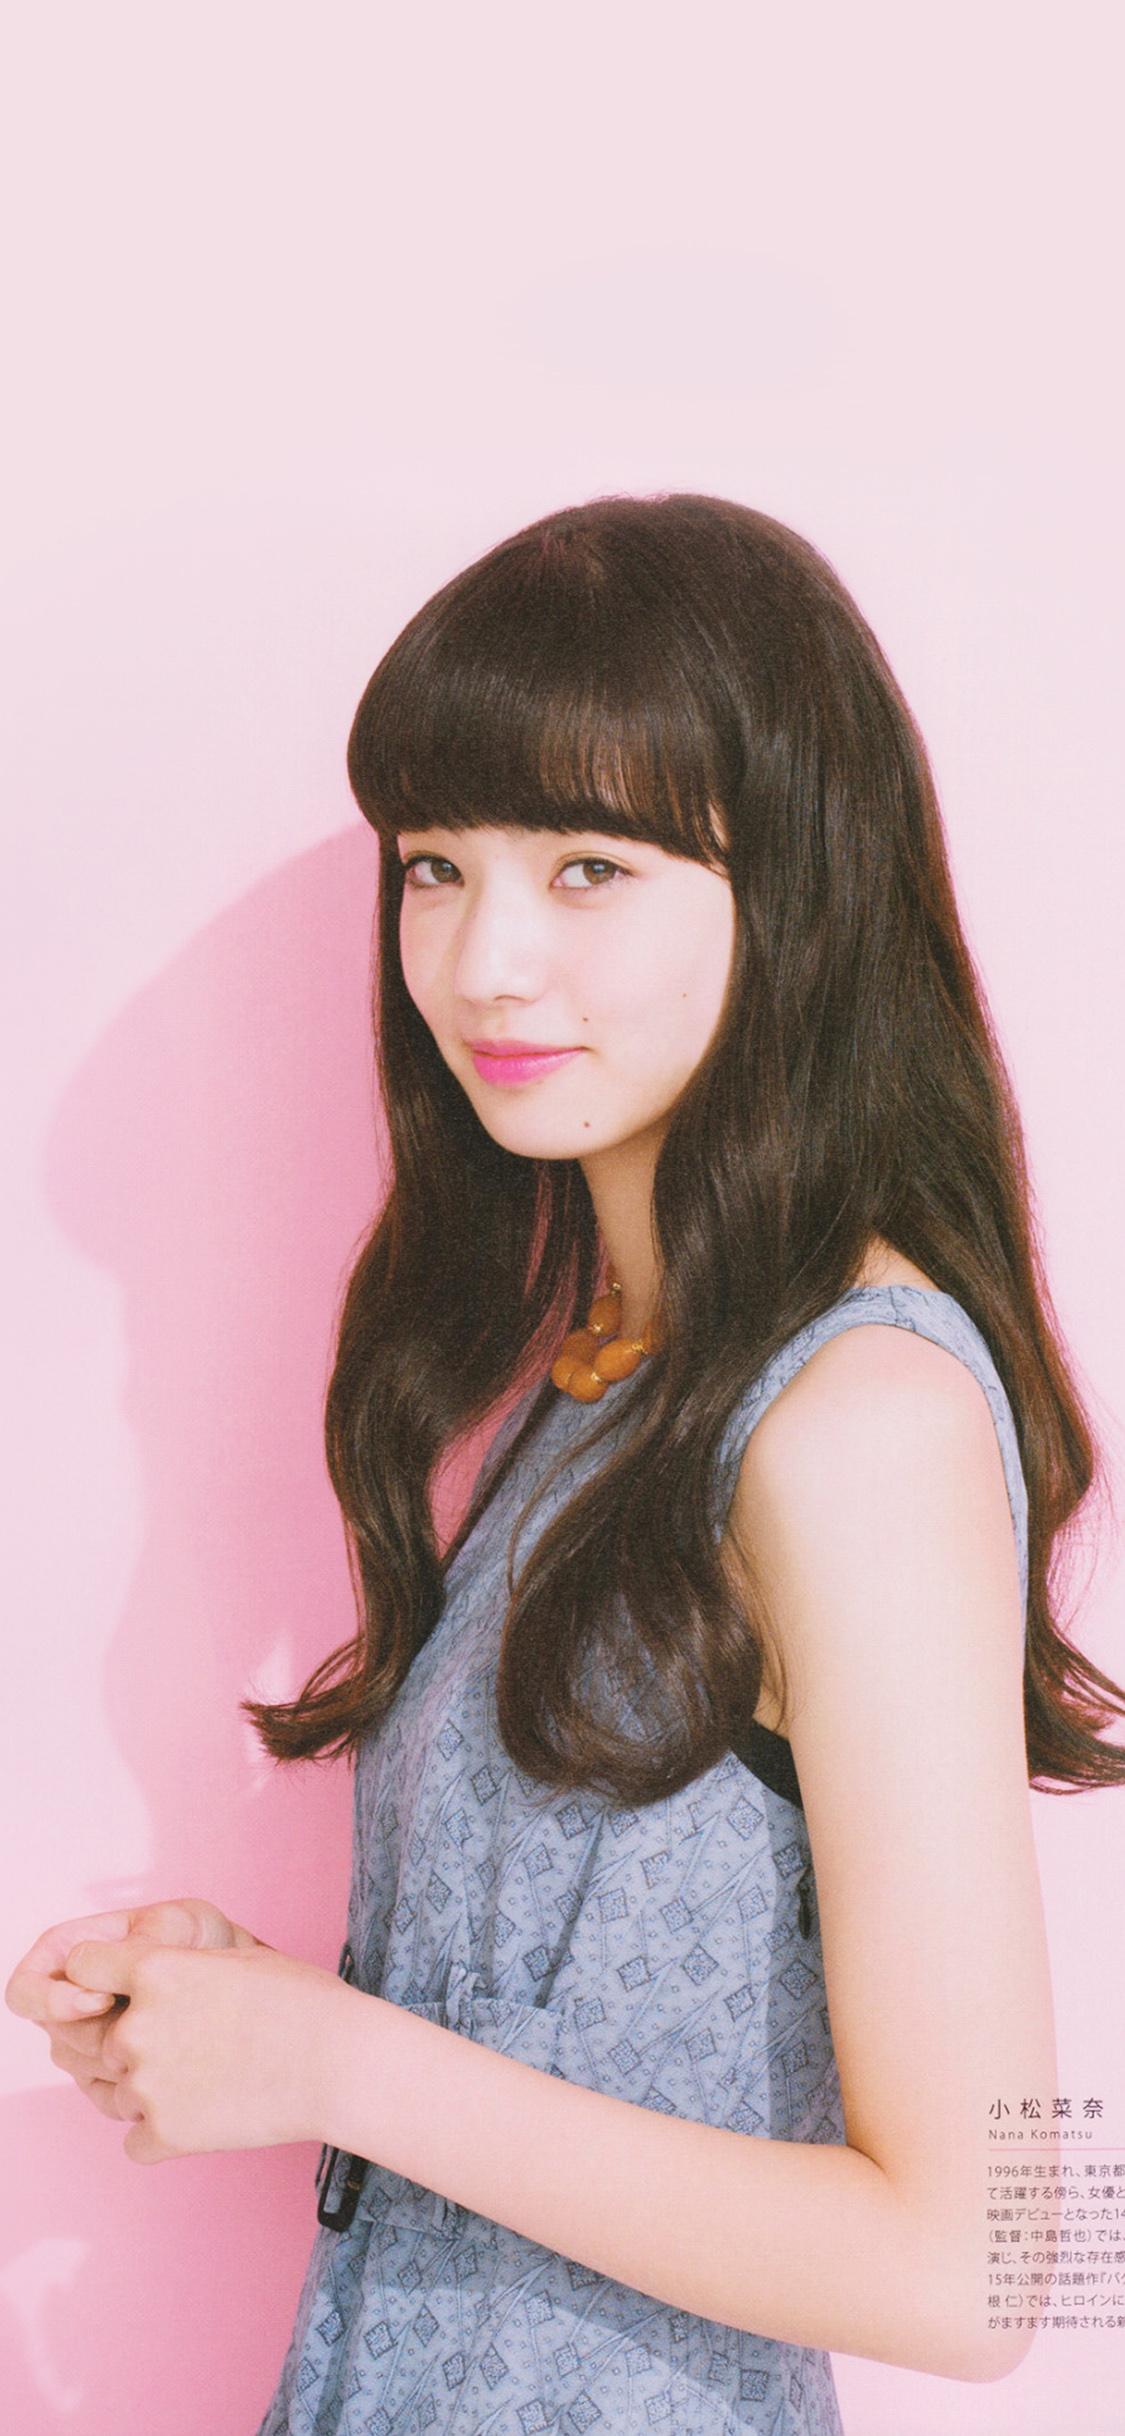 Droid X Girl Wallpaper Hn41 Nana Komatsu Cute Film Asian Girl Wallpaper